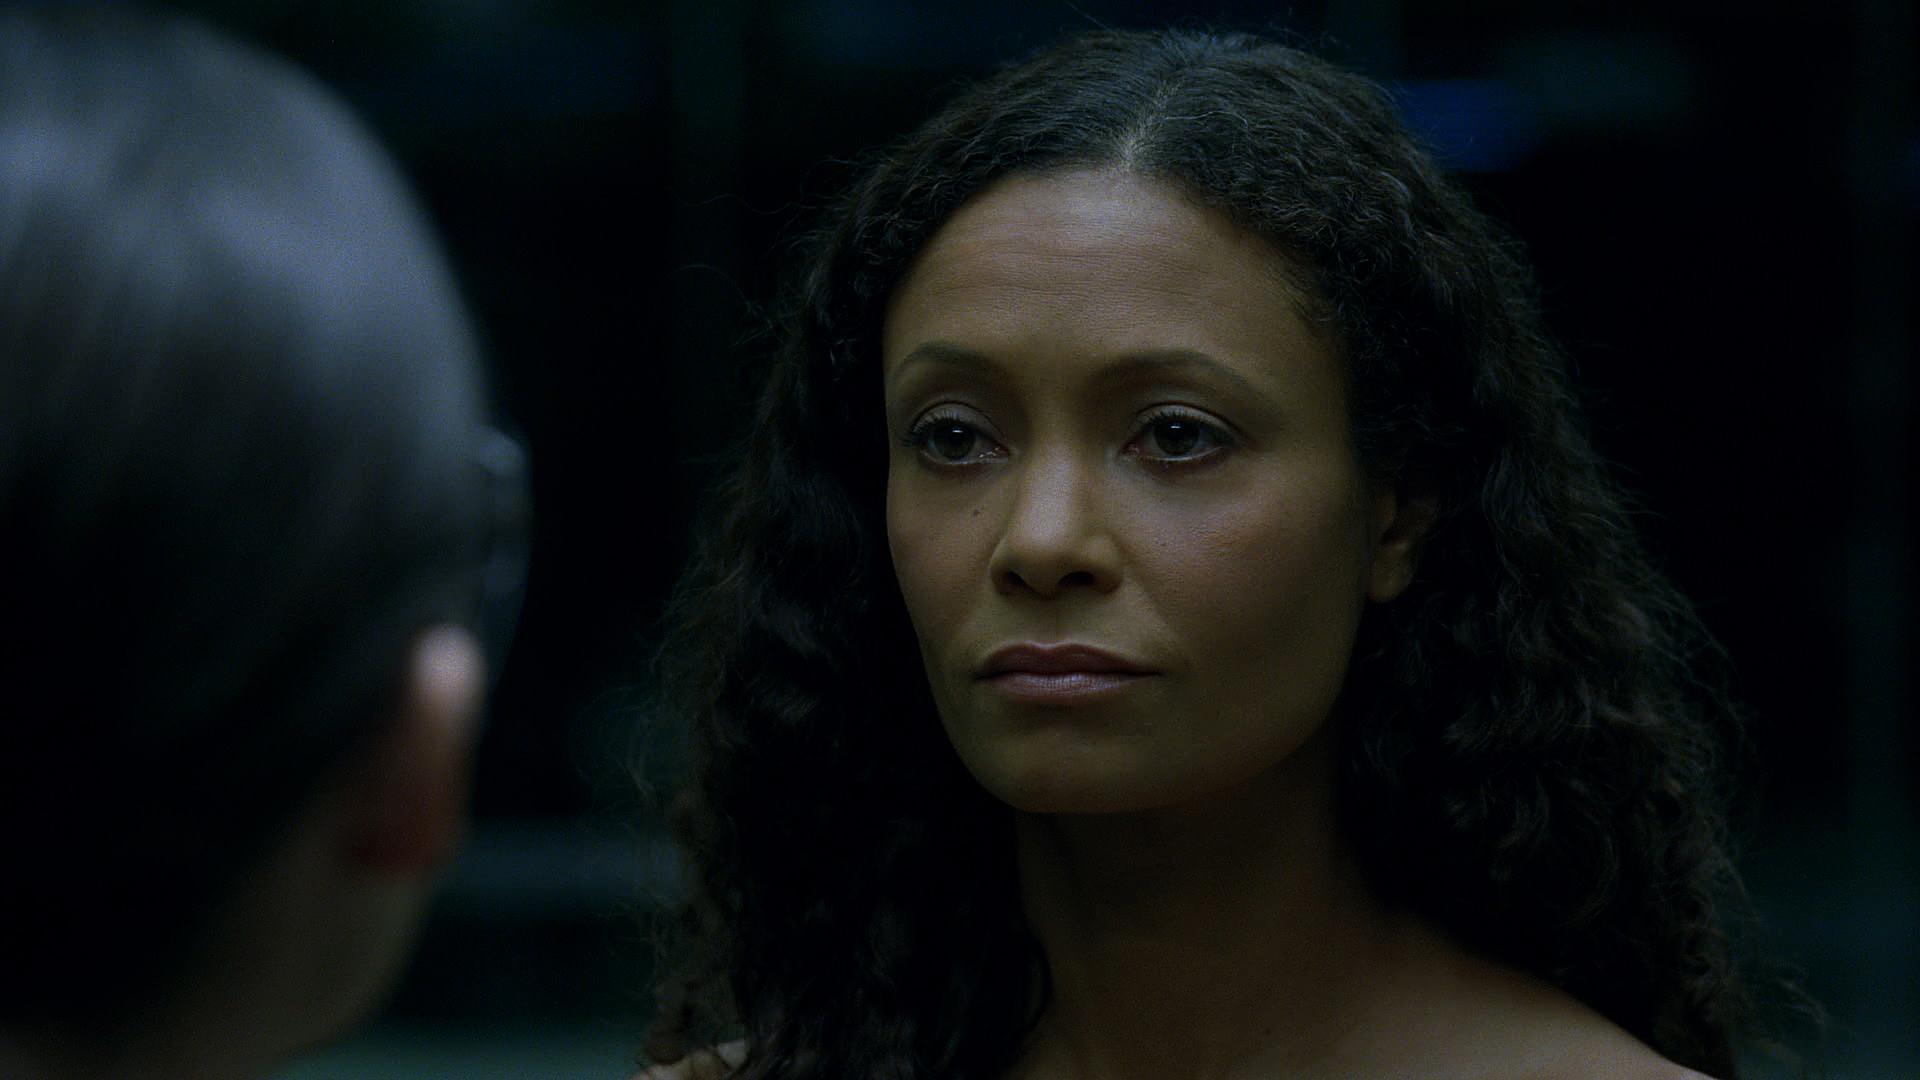 Thandie Newton as Maeve Millay.